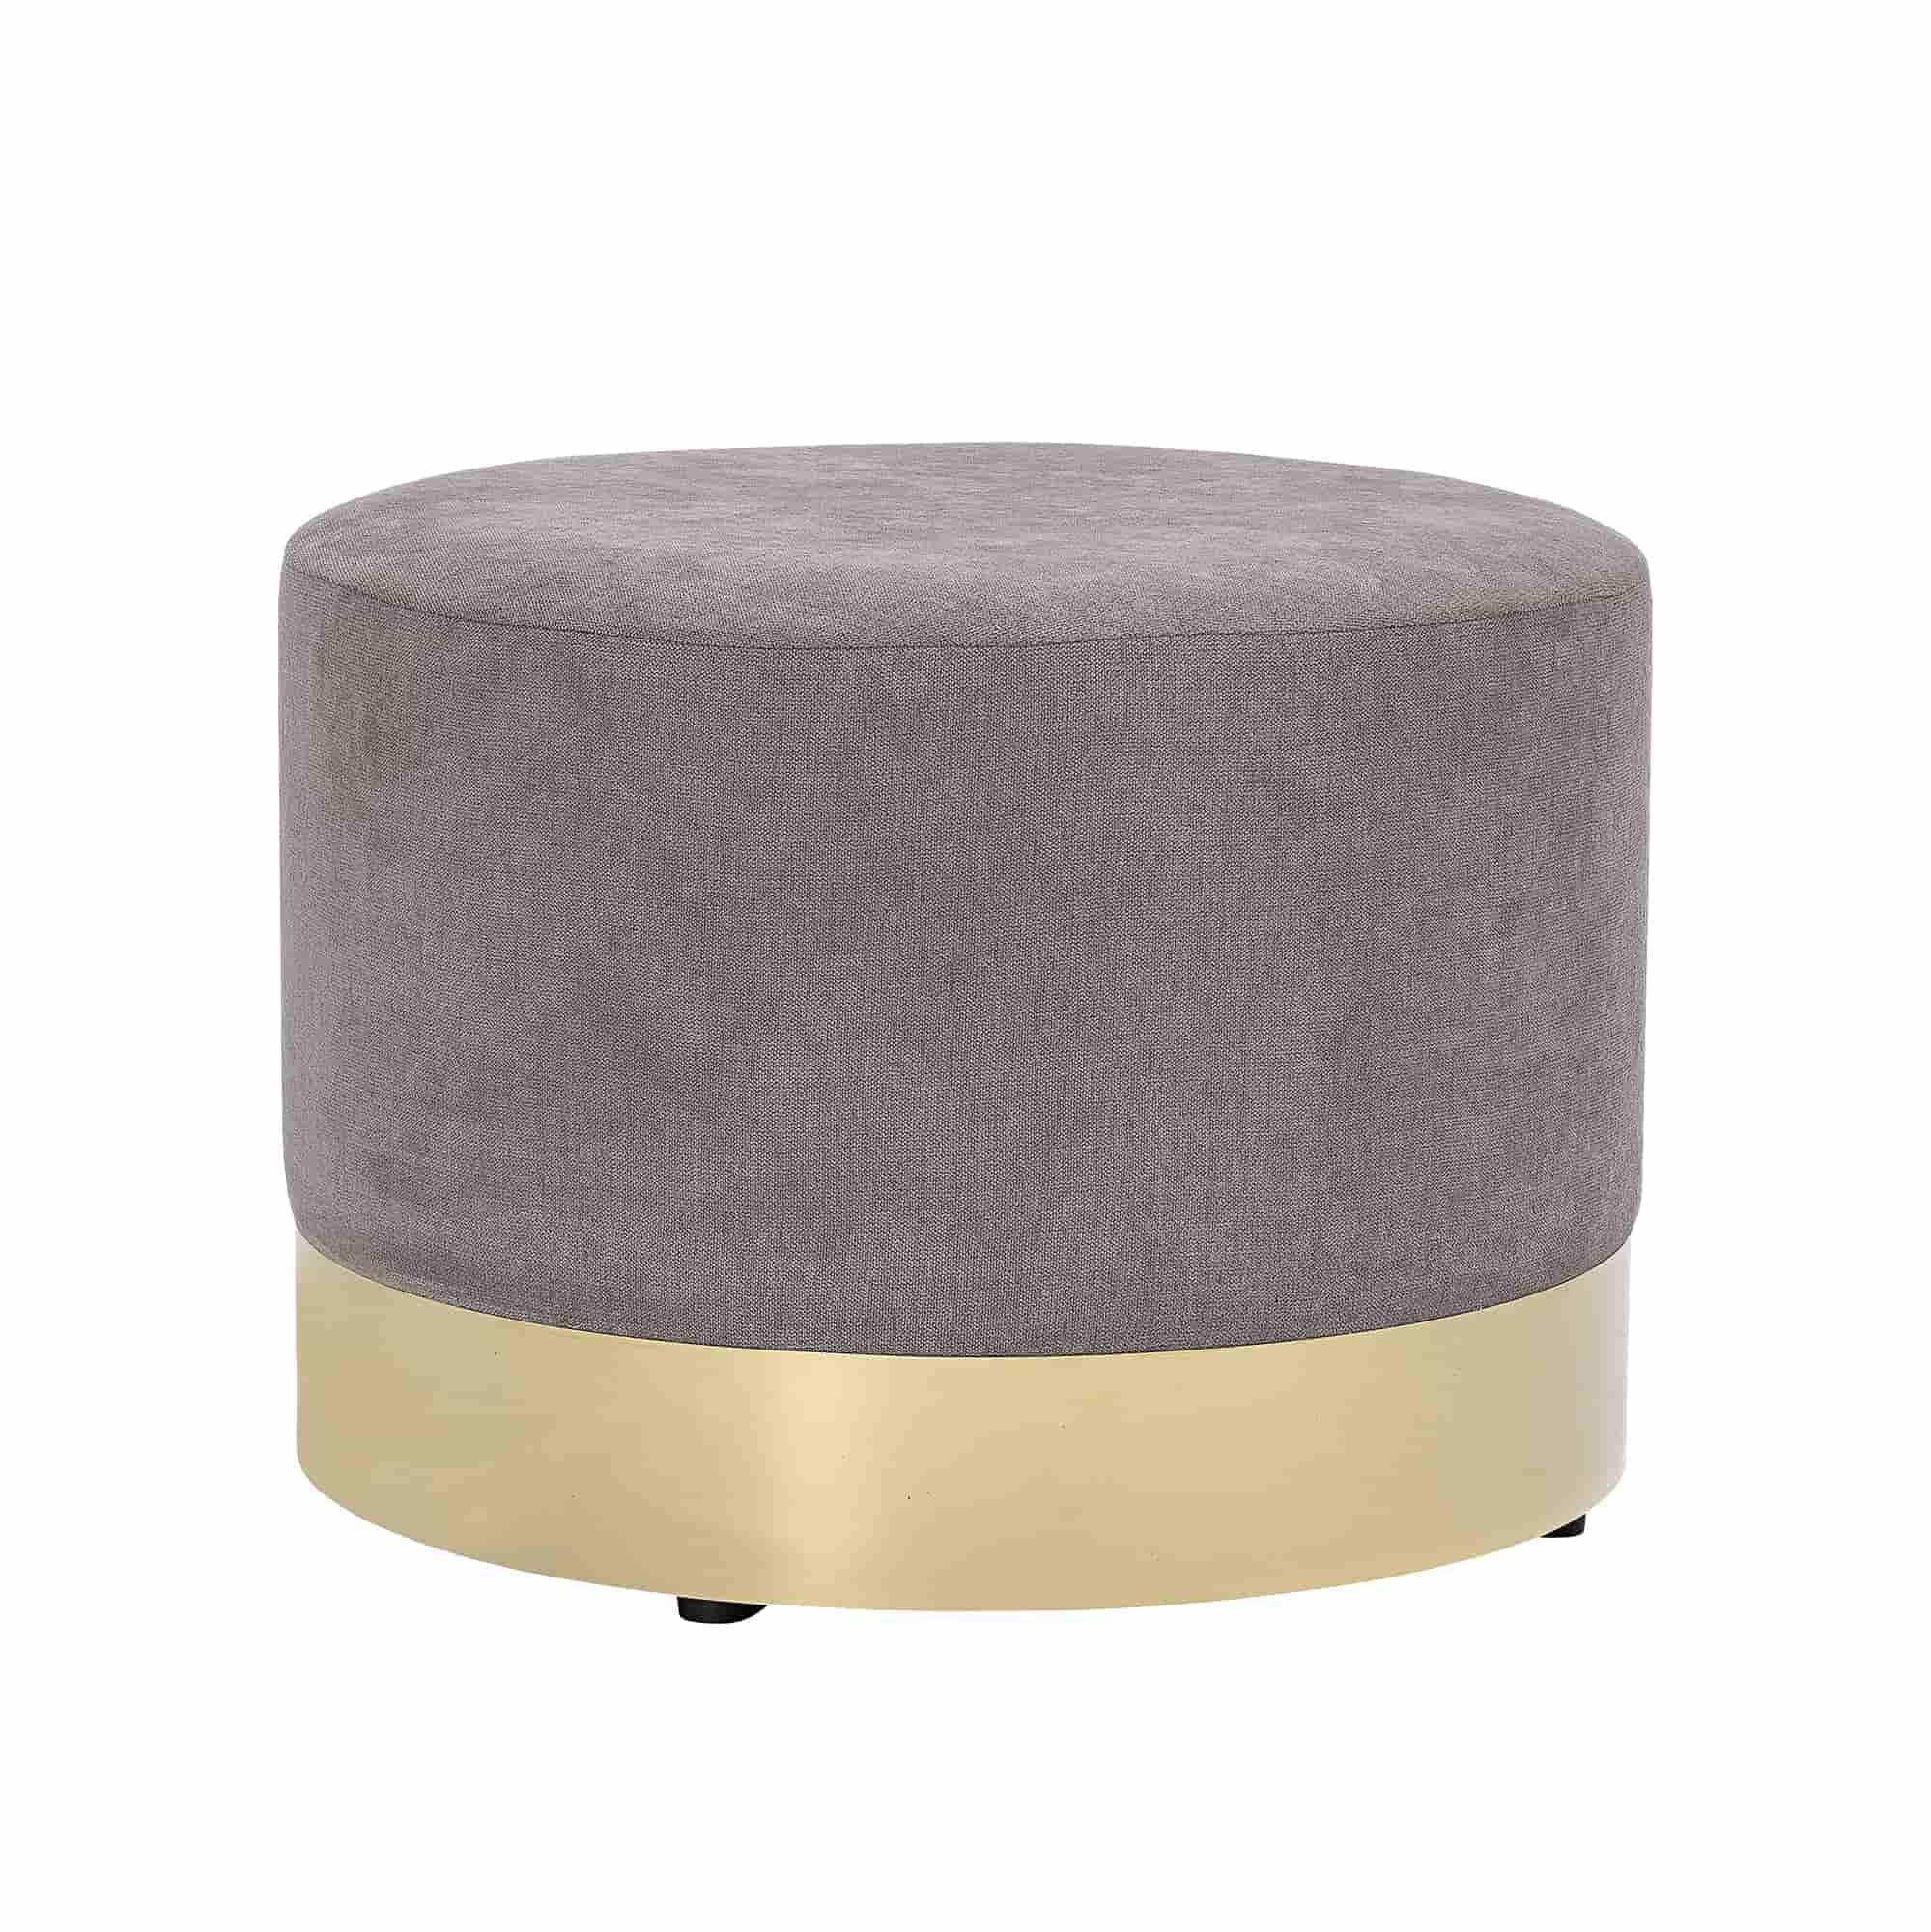 BLOOMINGVILLE Dia puf - grå/guld polyester/metal, rund (Ø55)